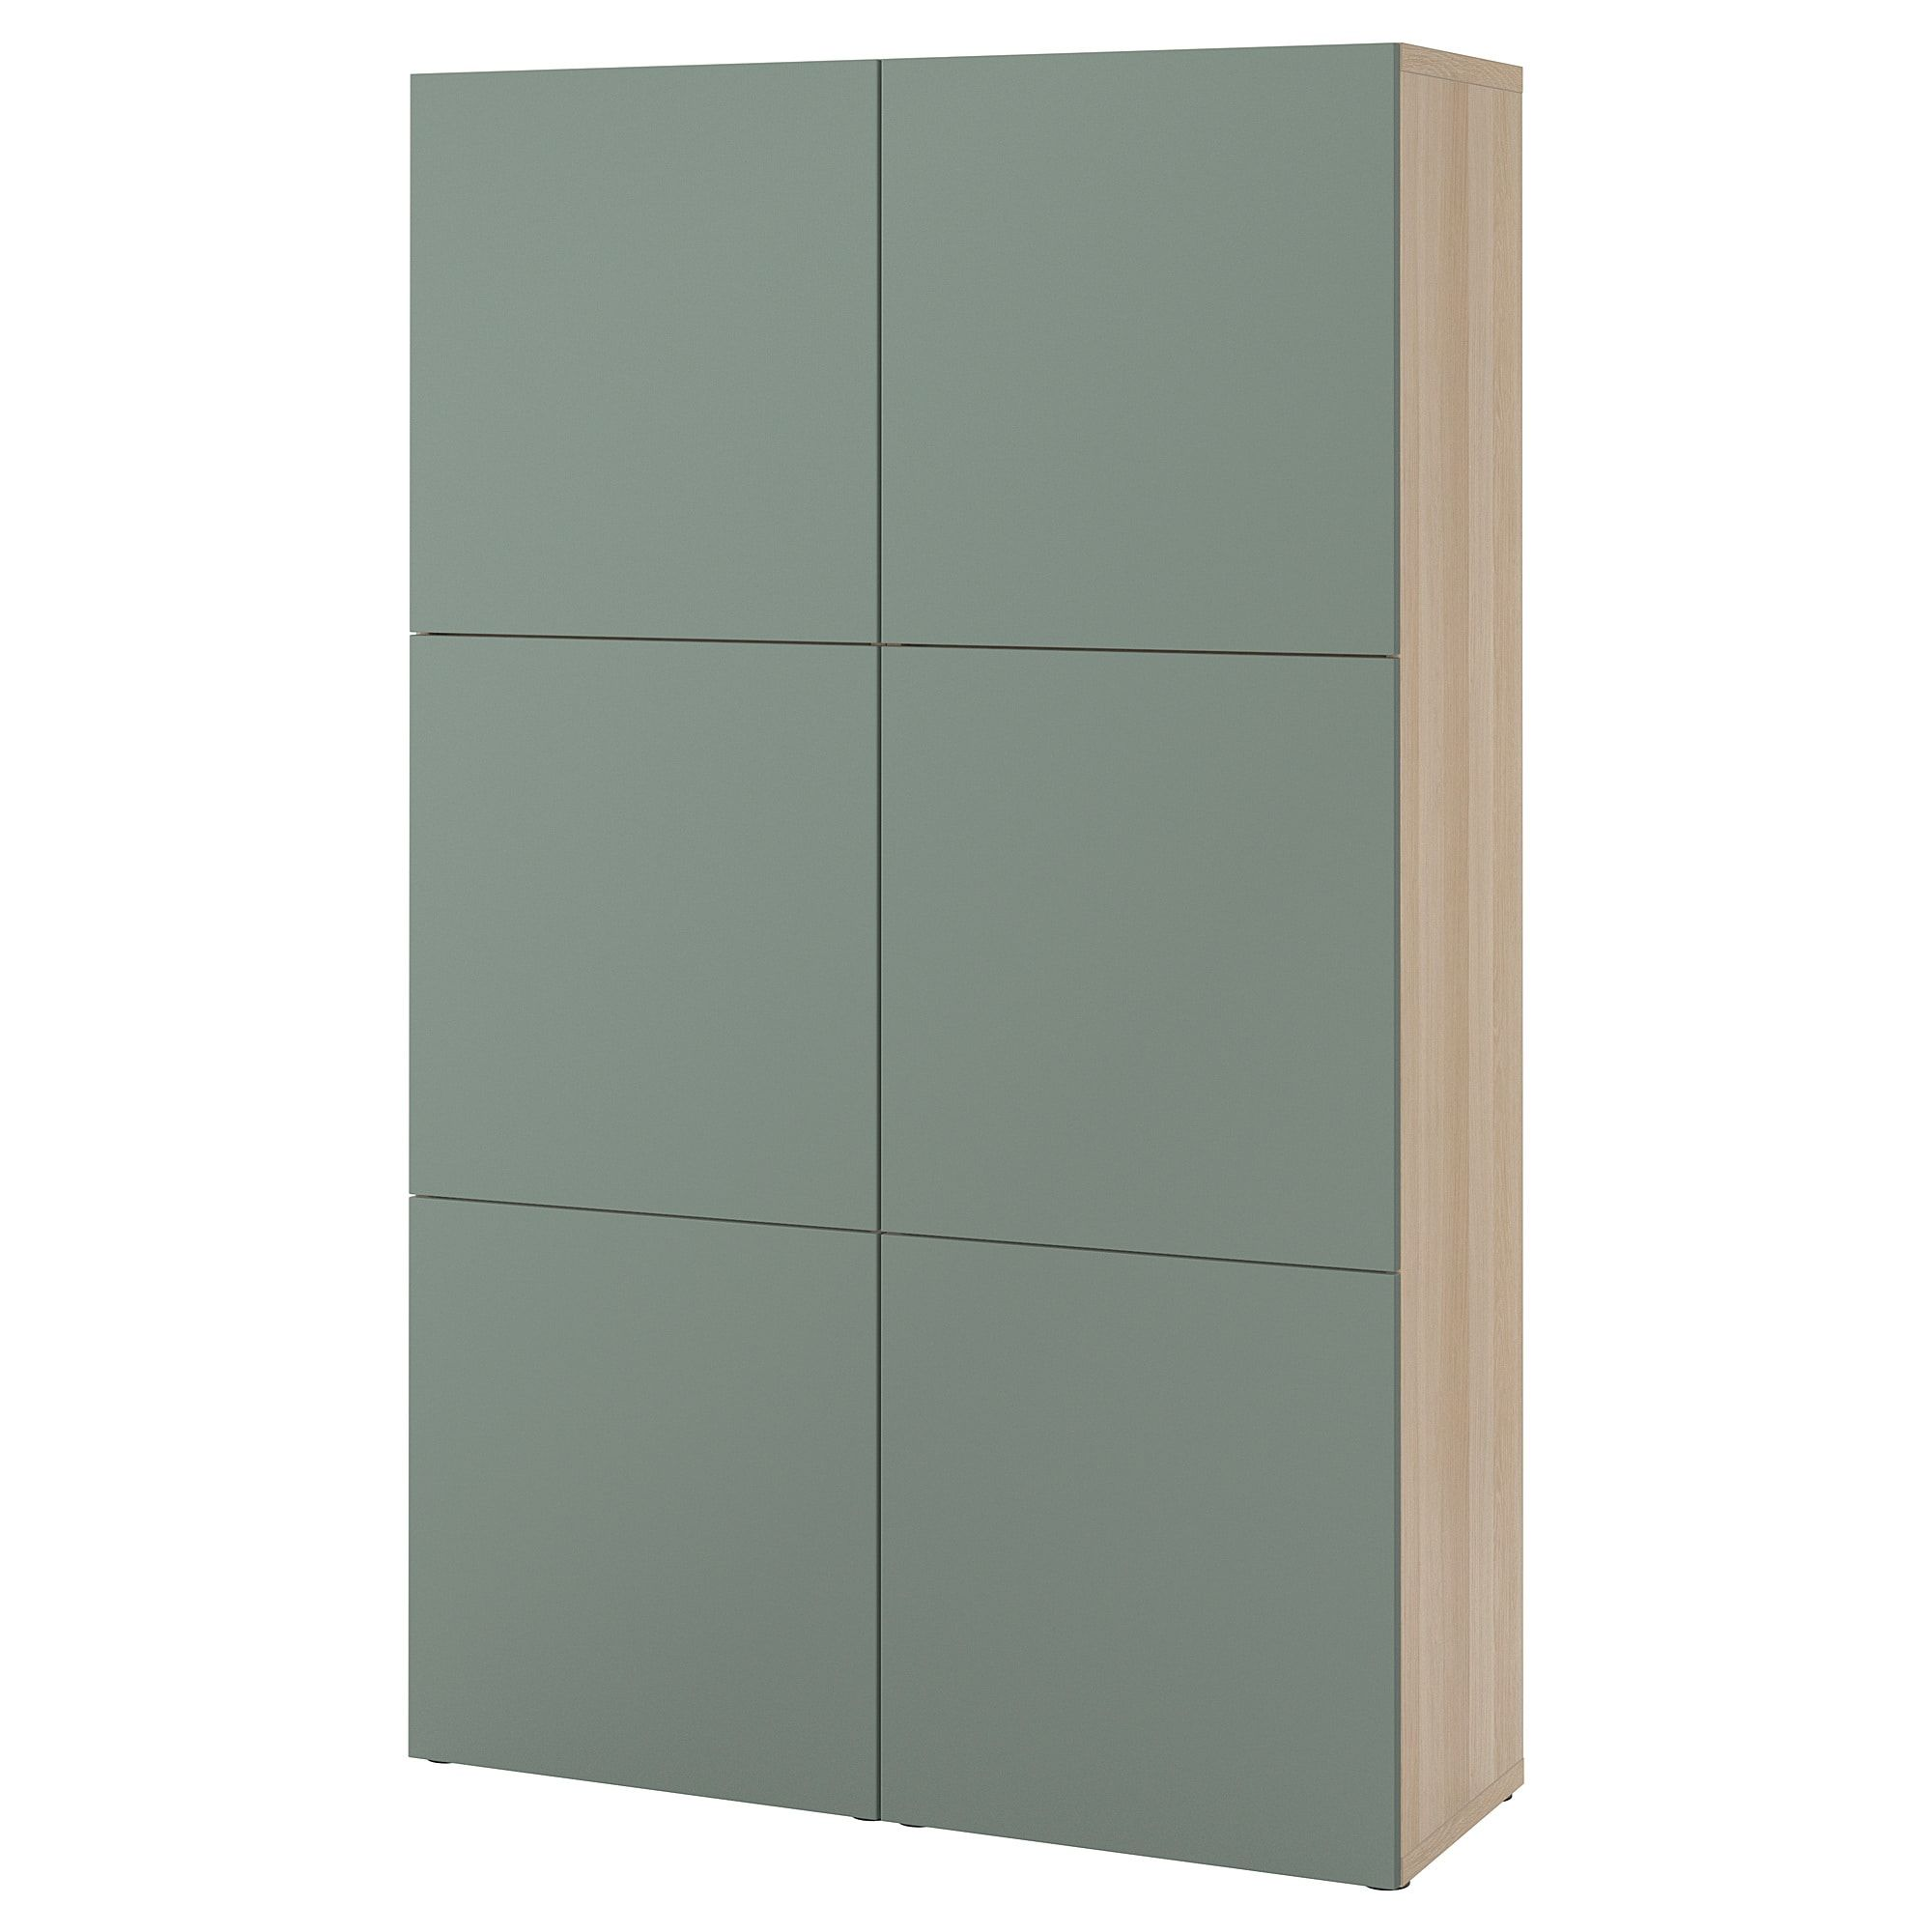 Kleiderschrank 50 Cm Tief Ikea